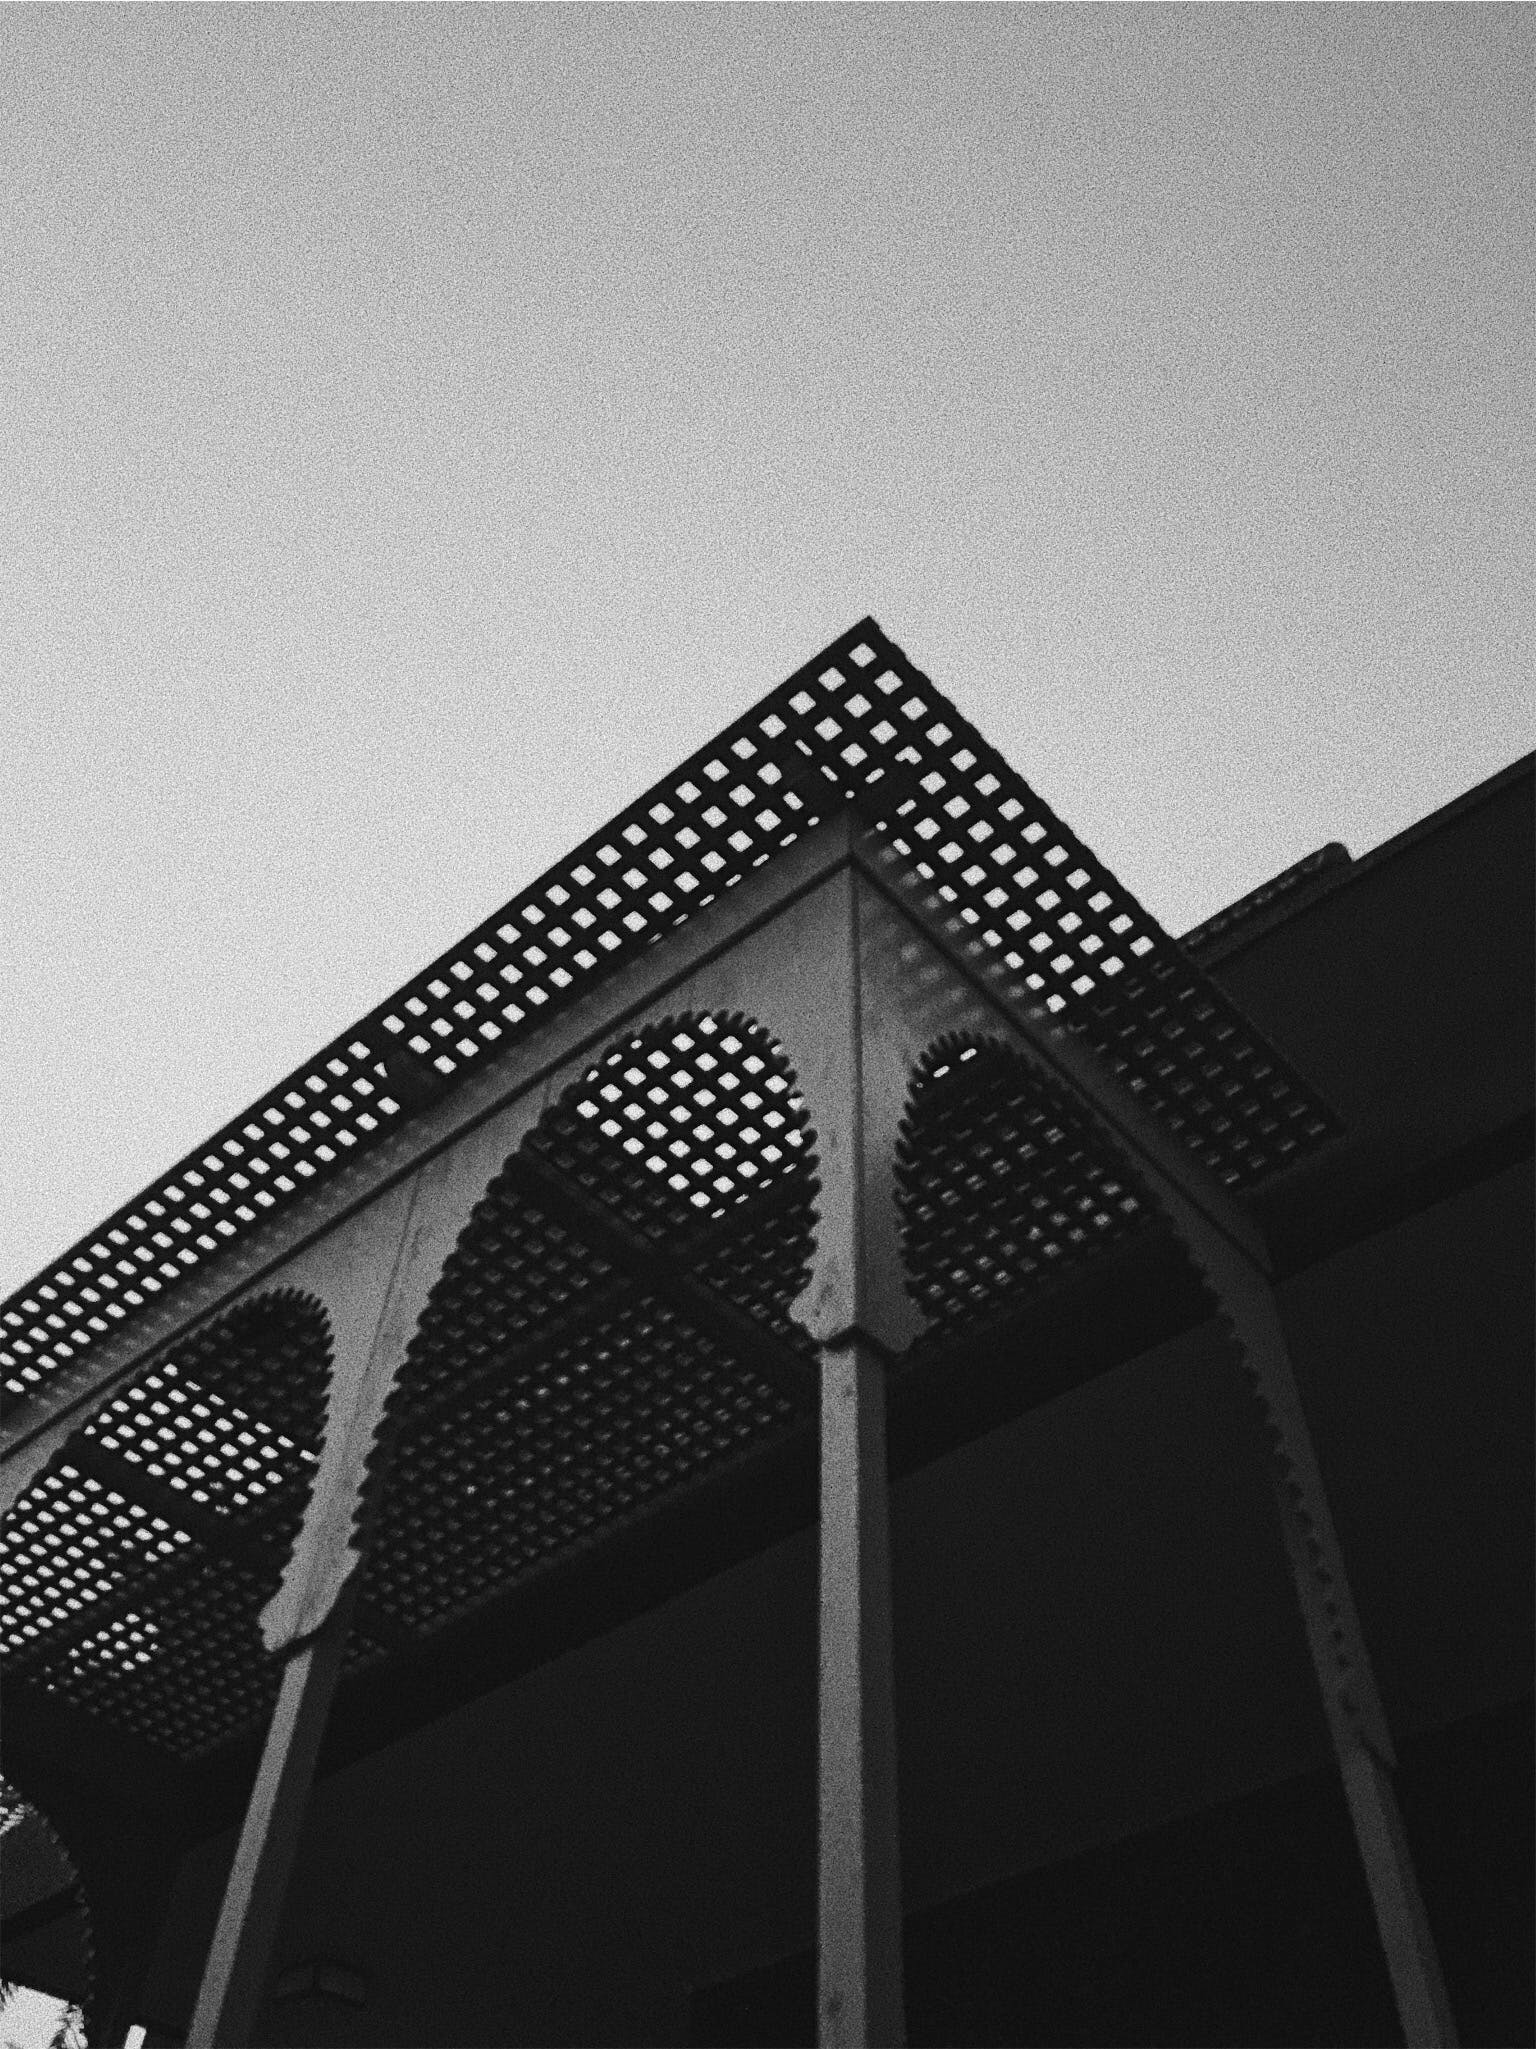 Gratis lagerfoto af arkitektdesign, arkitektur, dagslys, dagtimer